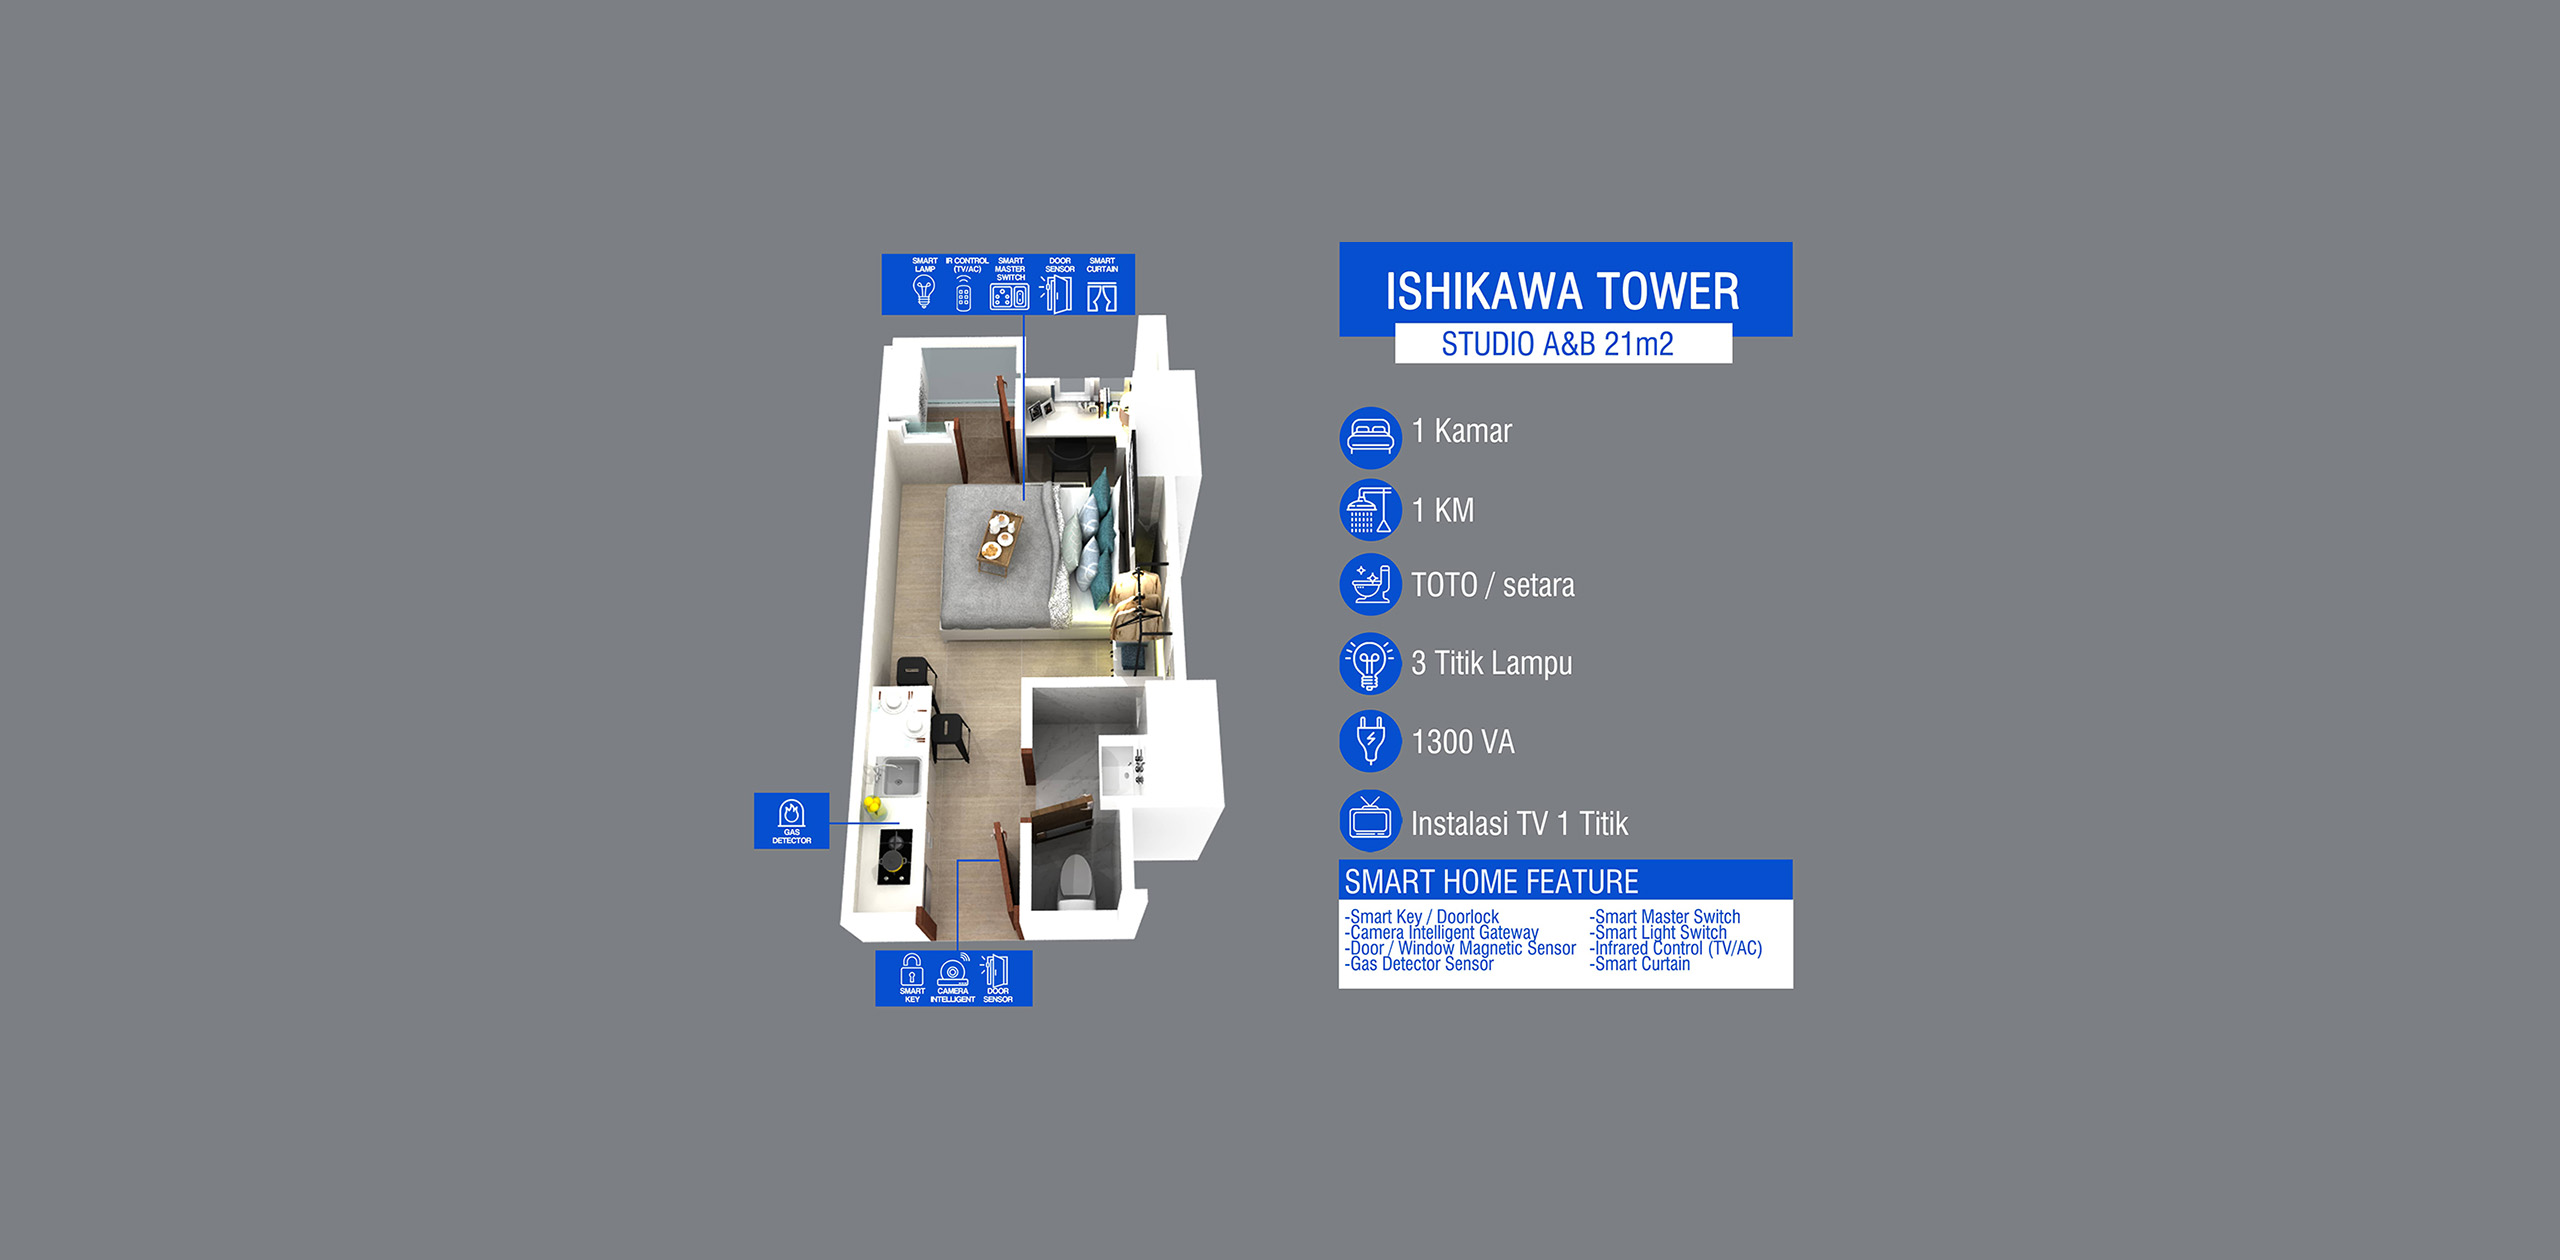 Pik2 - Ishikawa Tower - Studio (21 m2)